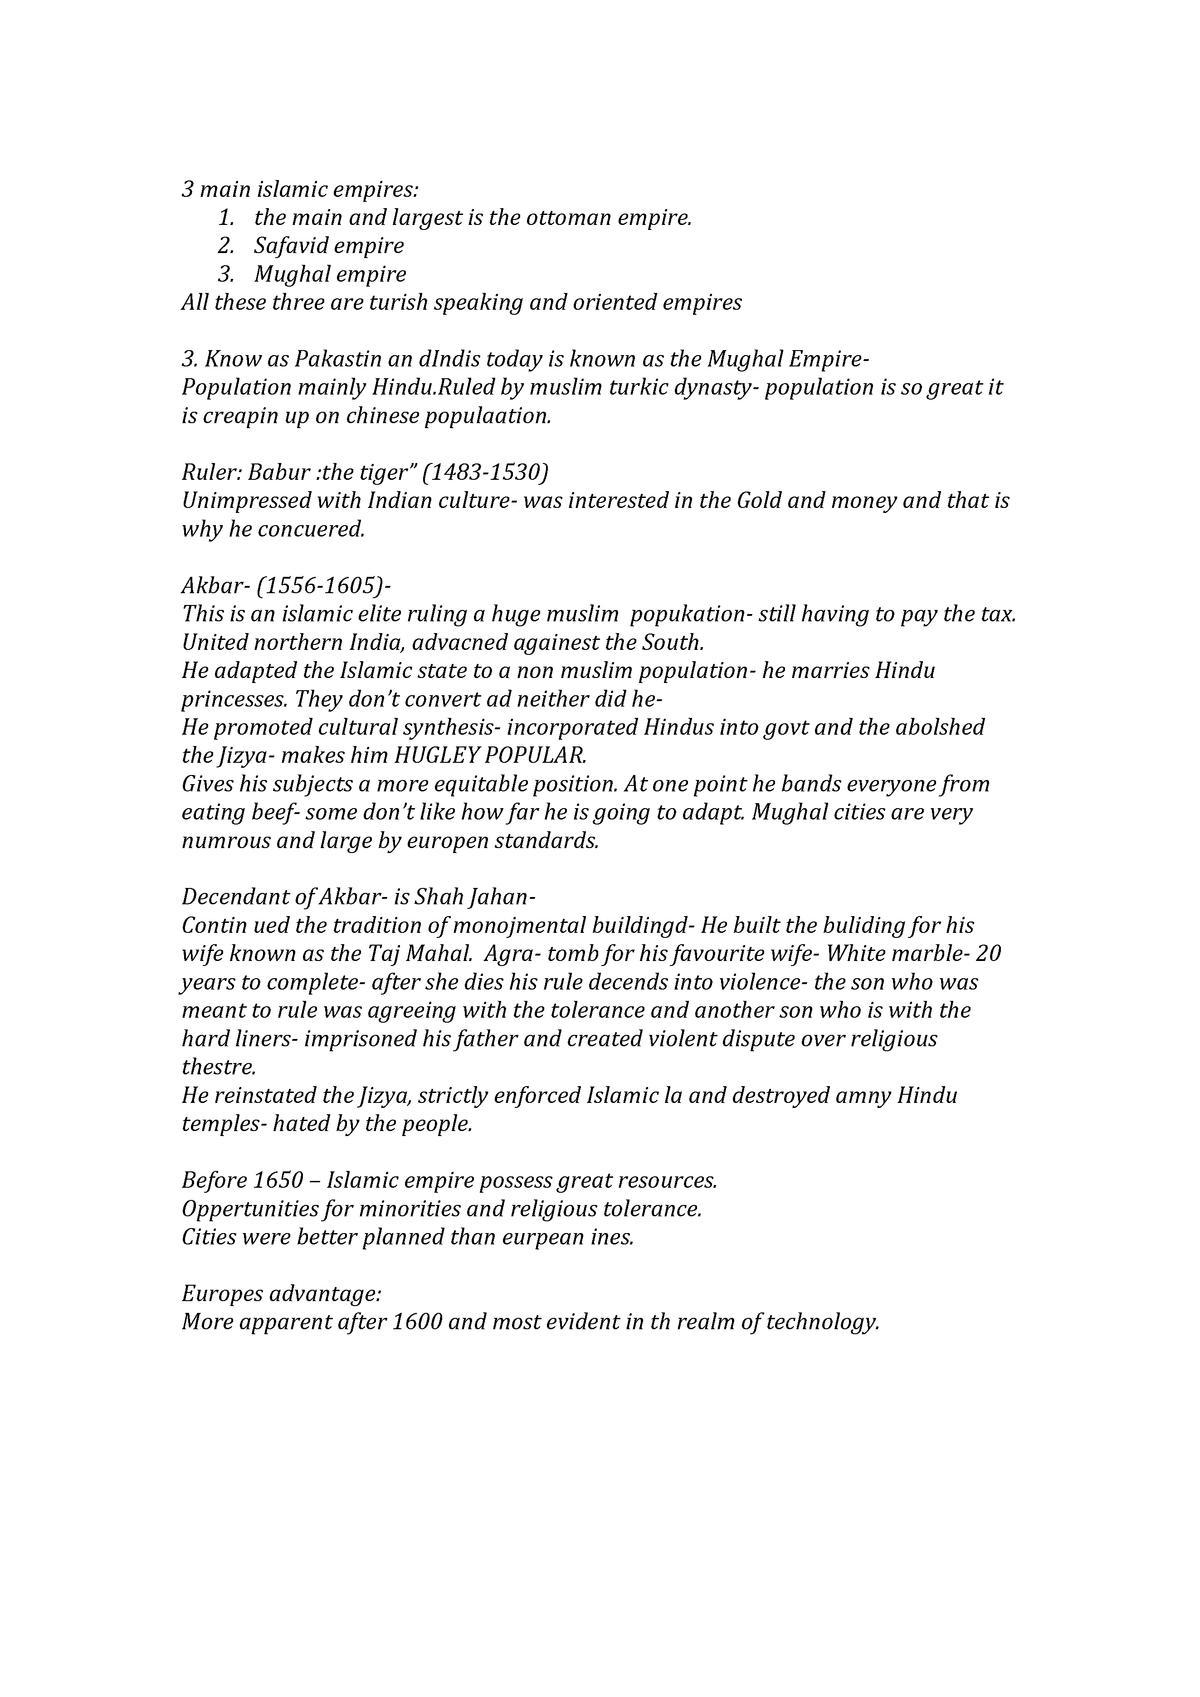 Side Notes HIST 228 - short summary - HIST228 - StuDocu